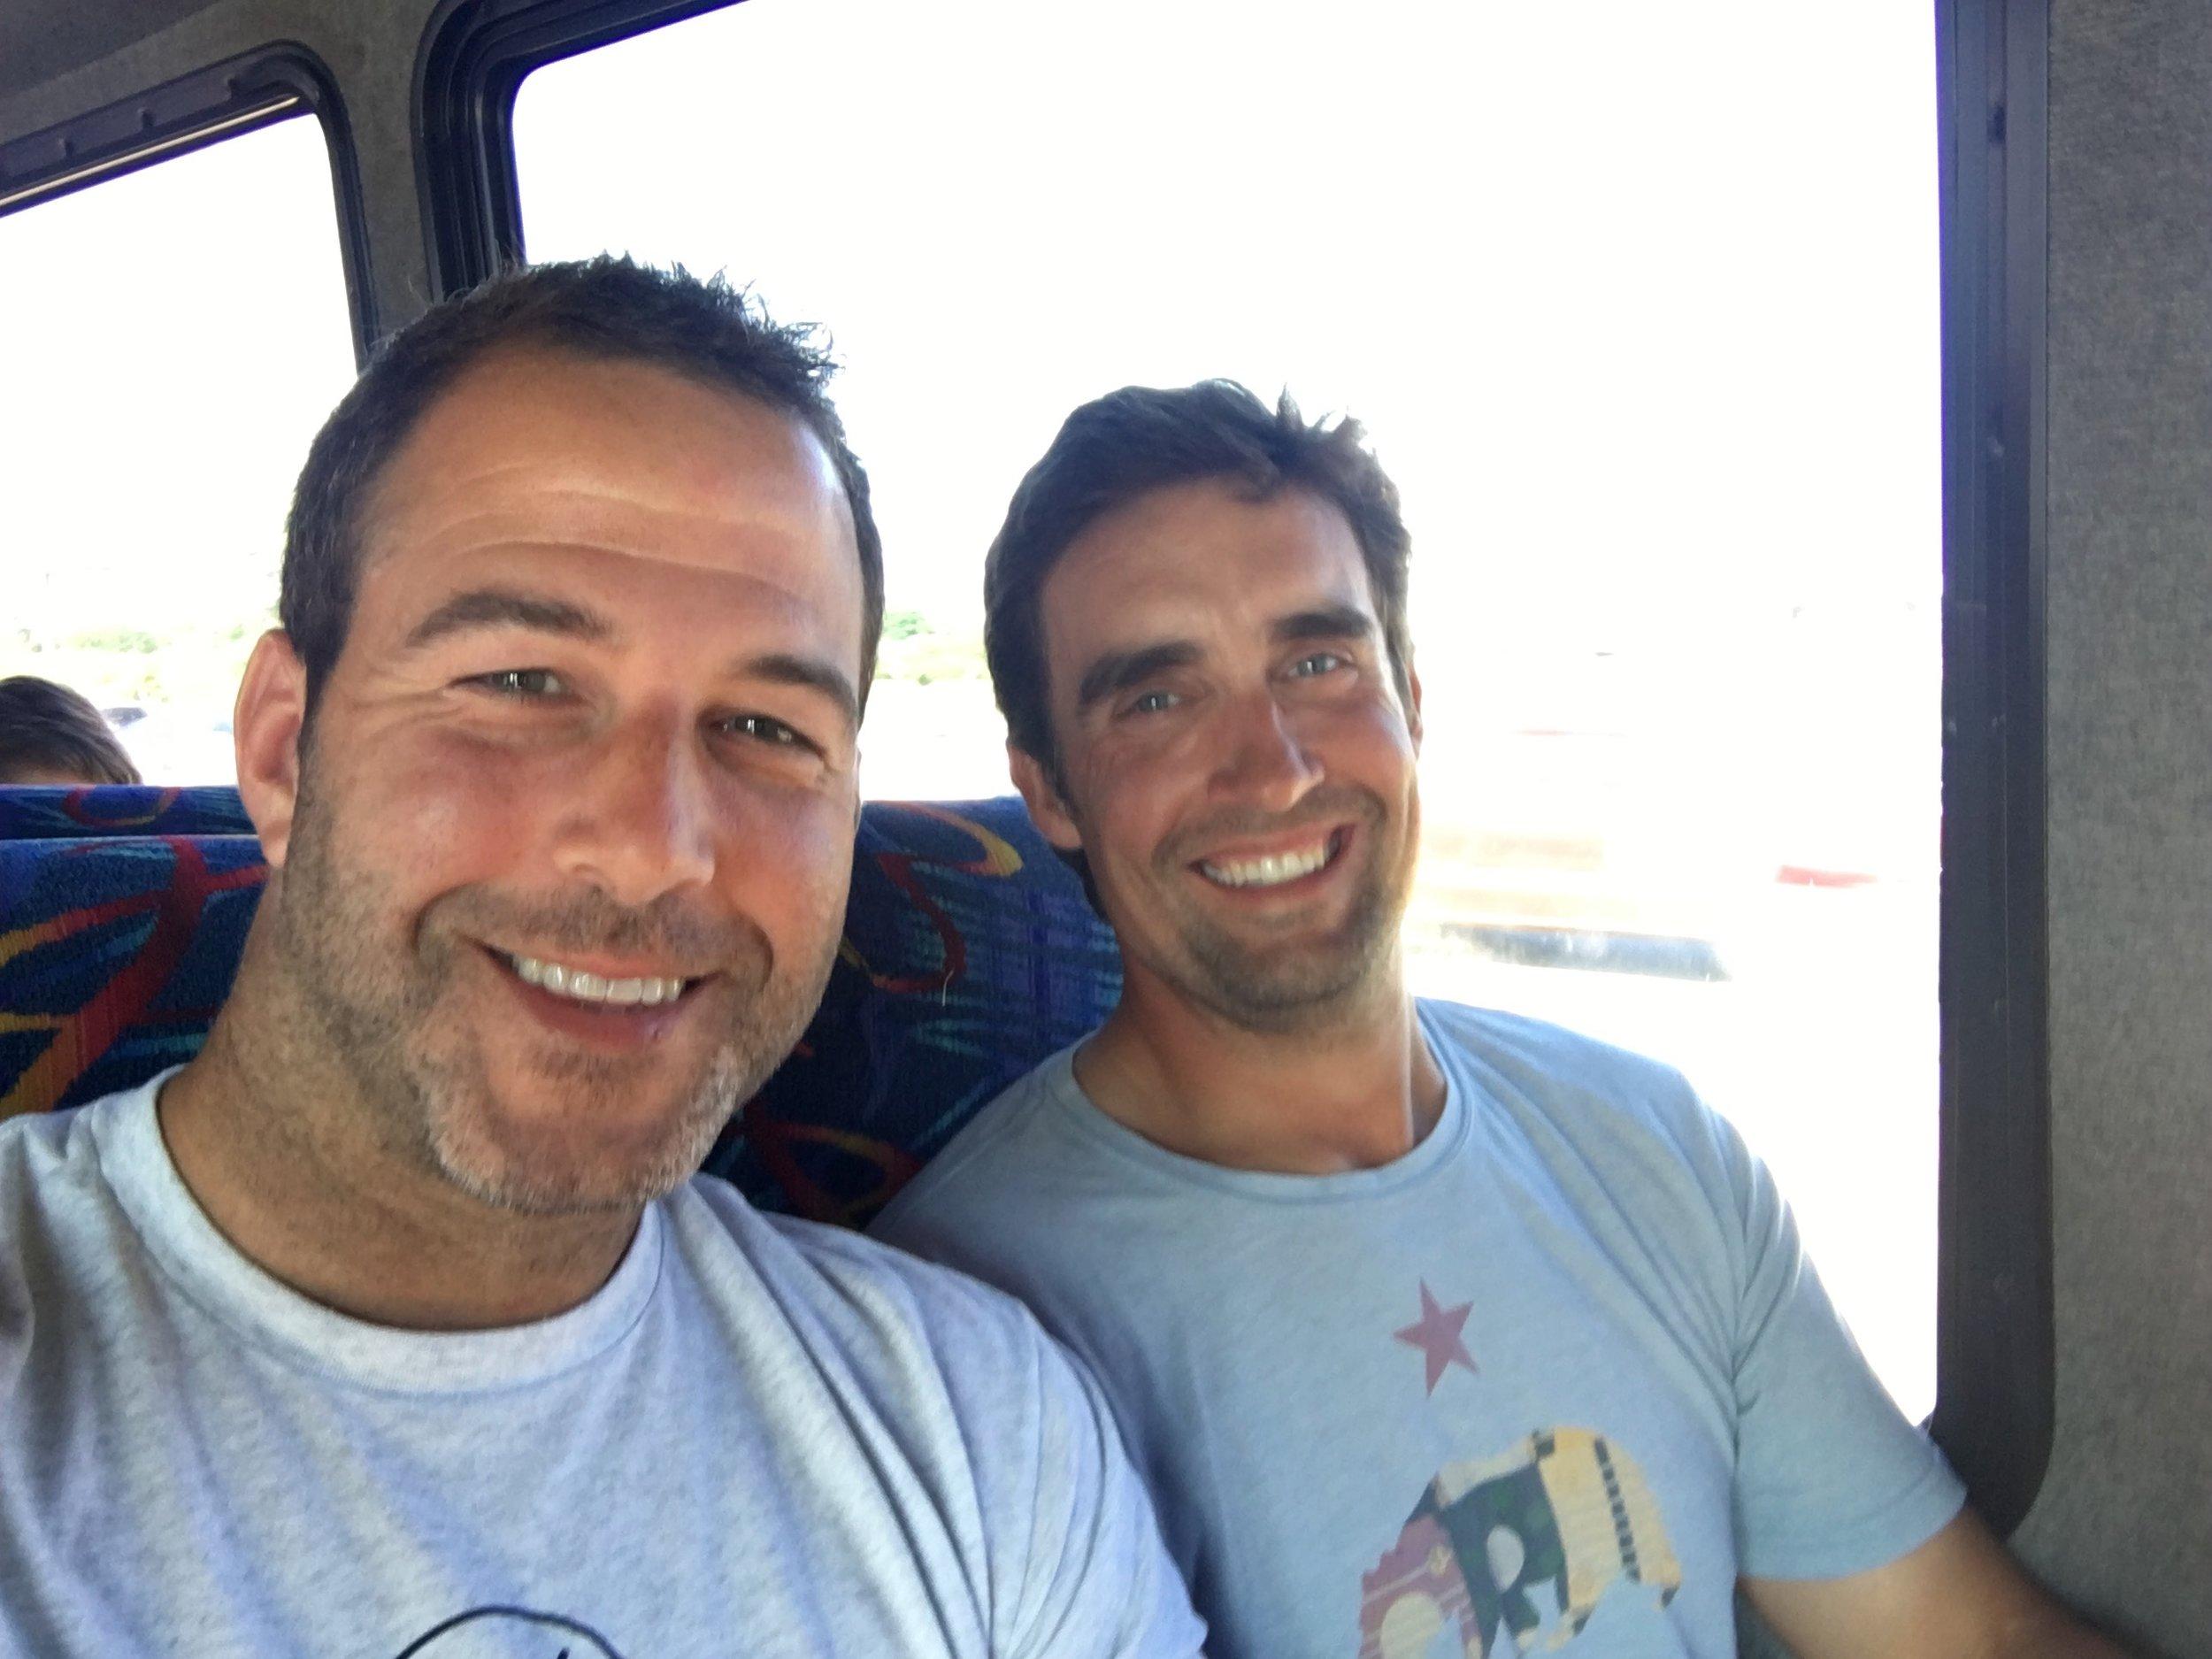 Bus buddies